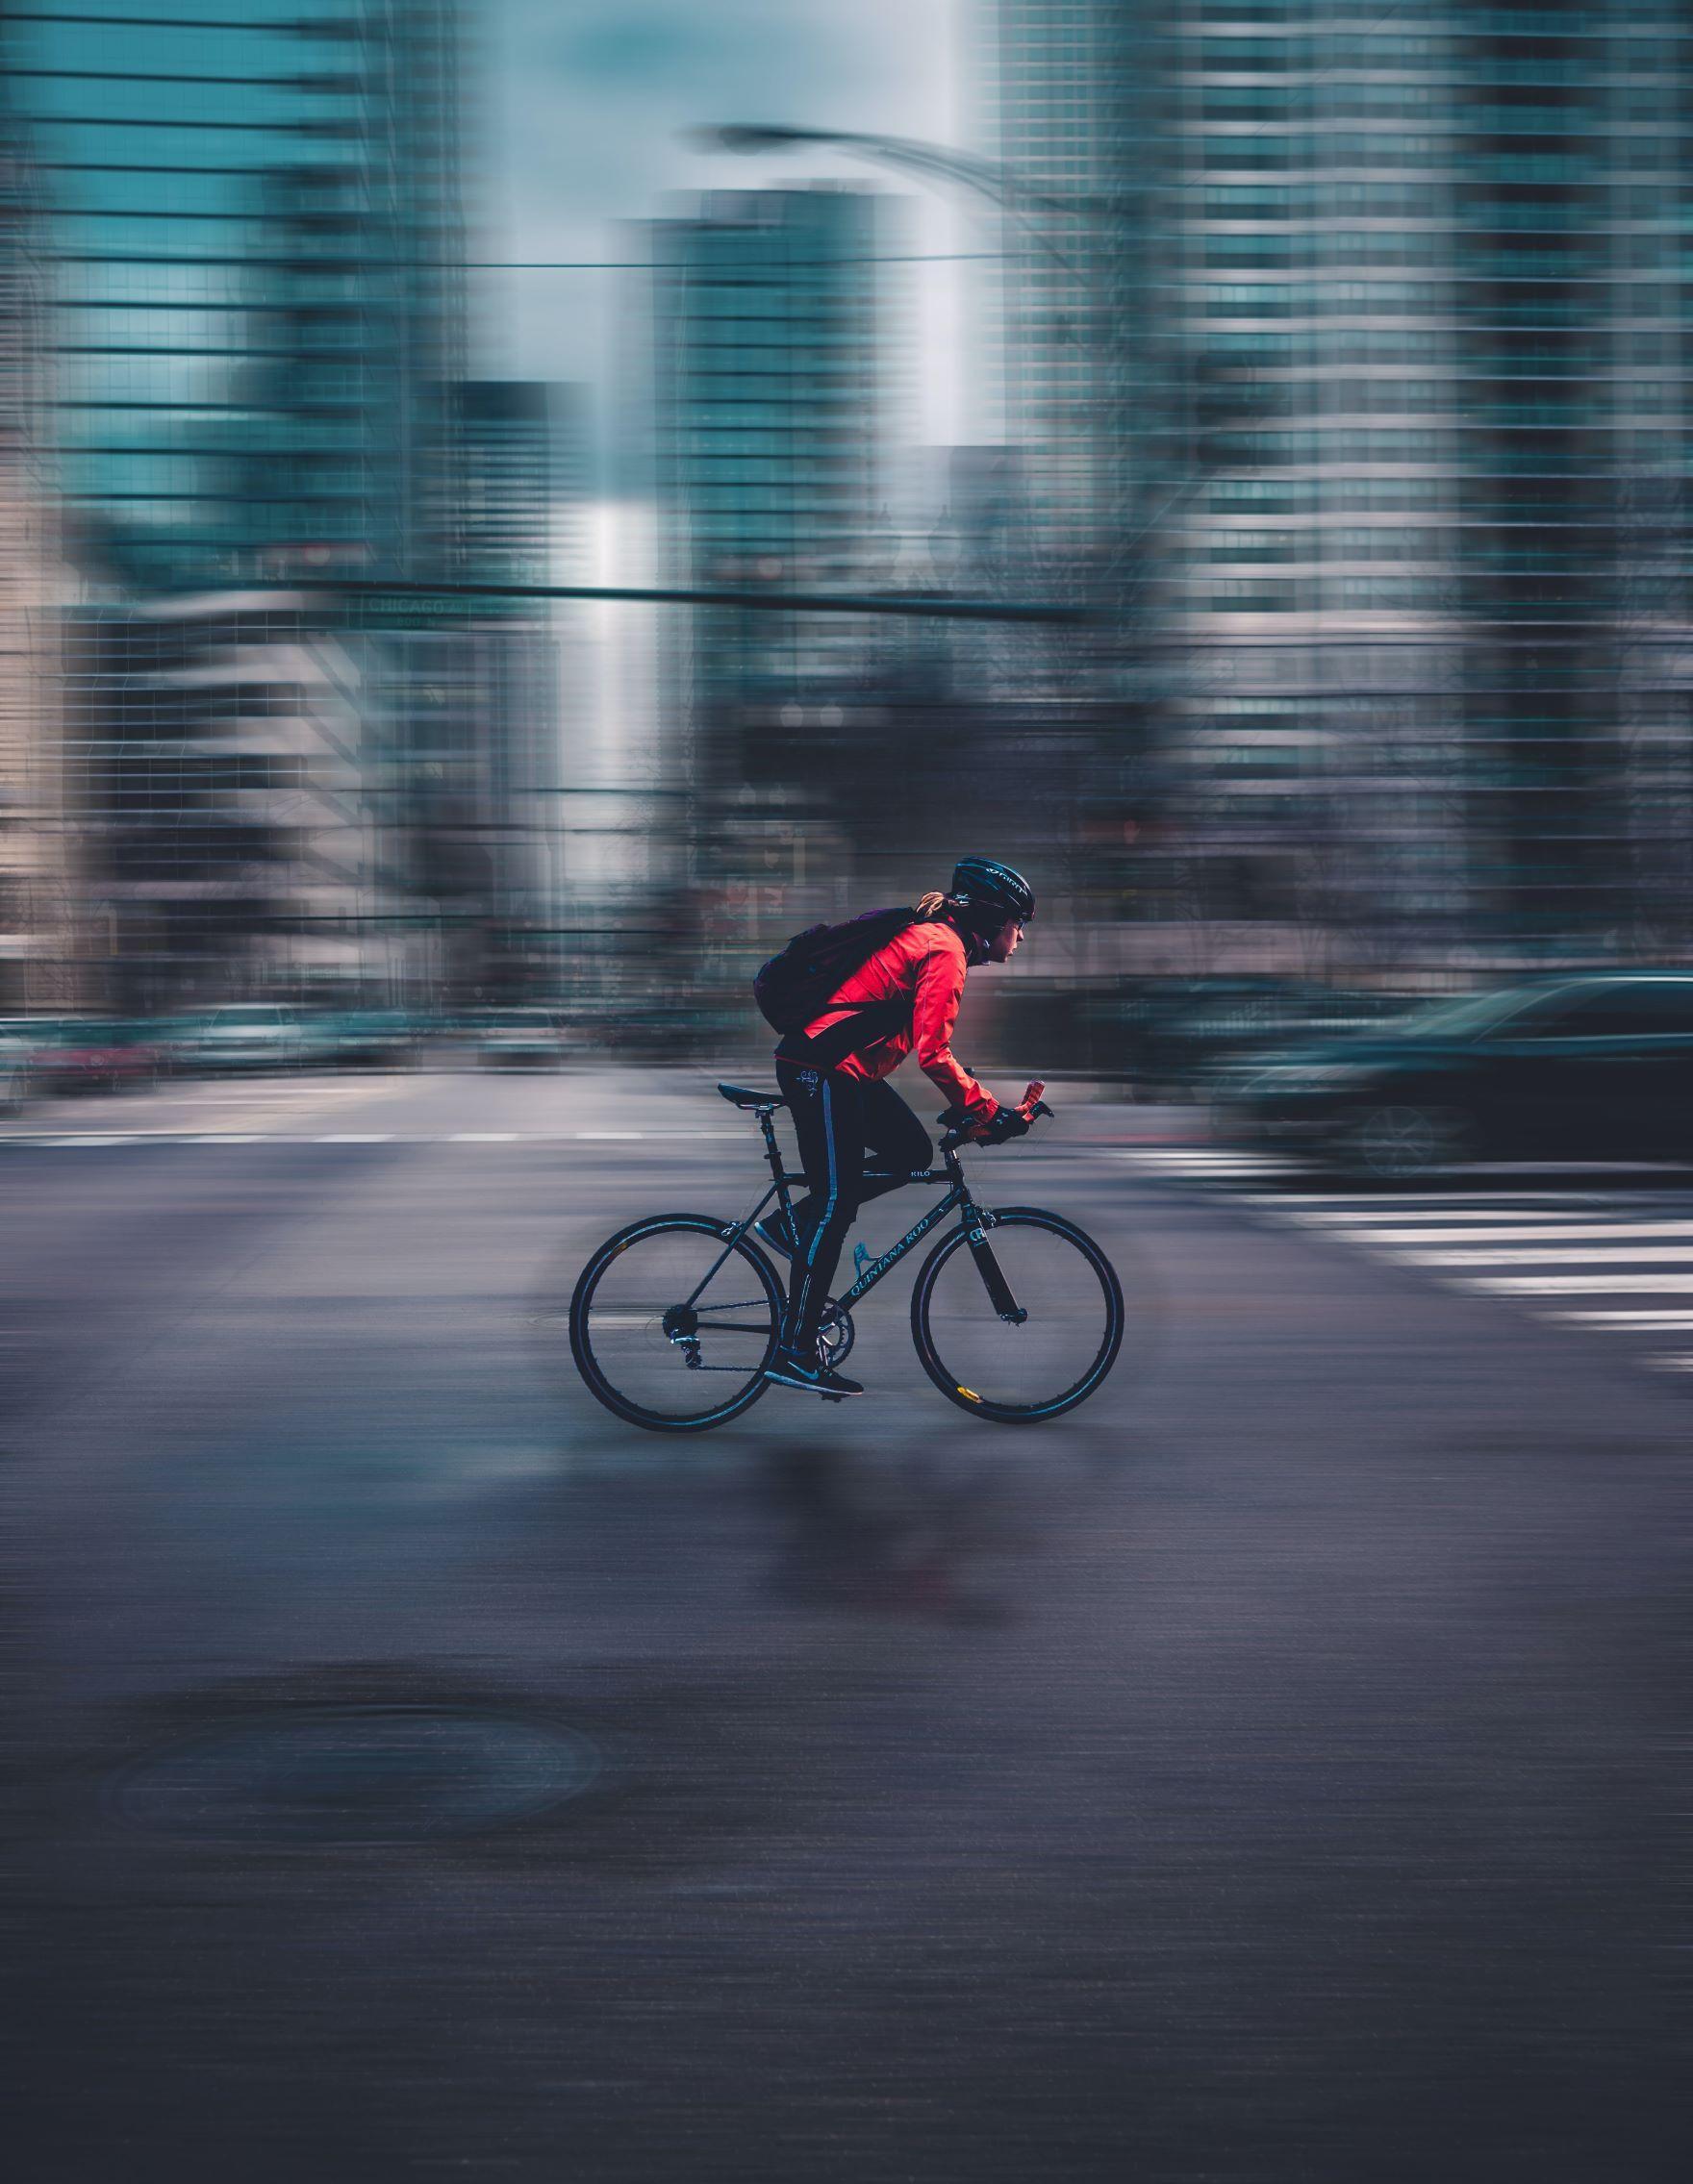 Photo of someone biking in the city